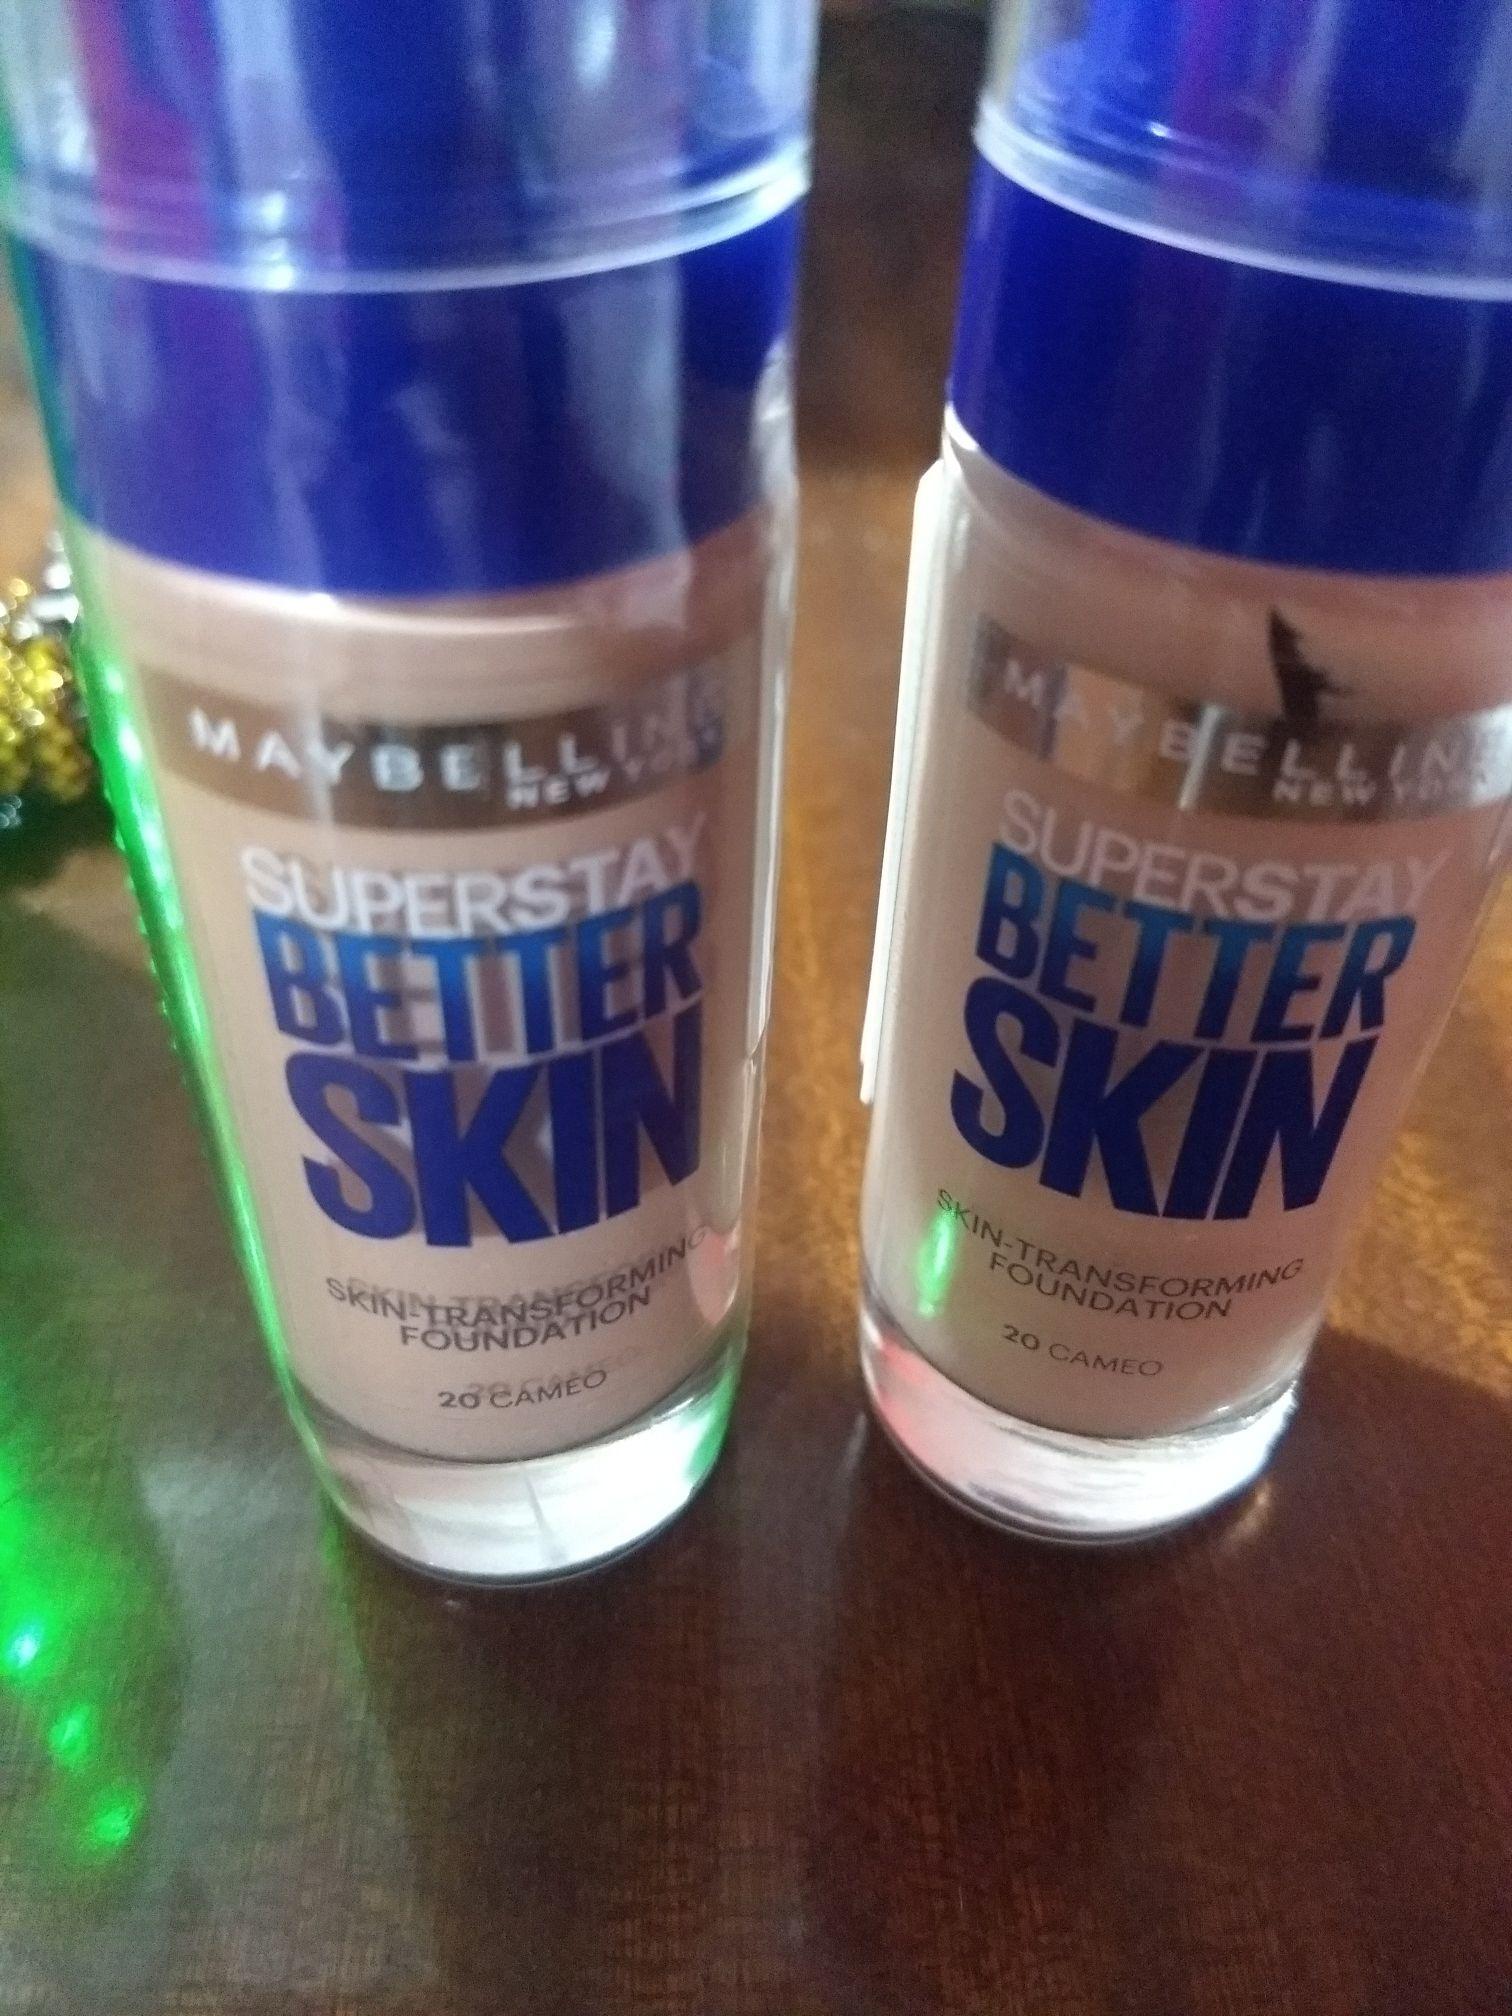 Walmart: Maquillaje maybelline a $40.02